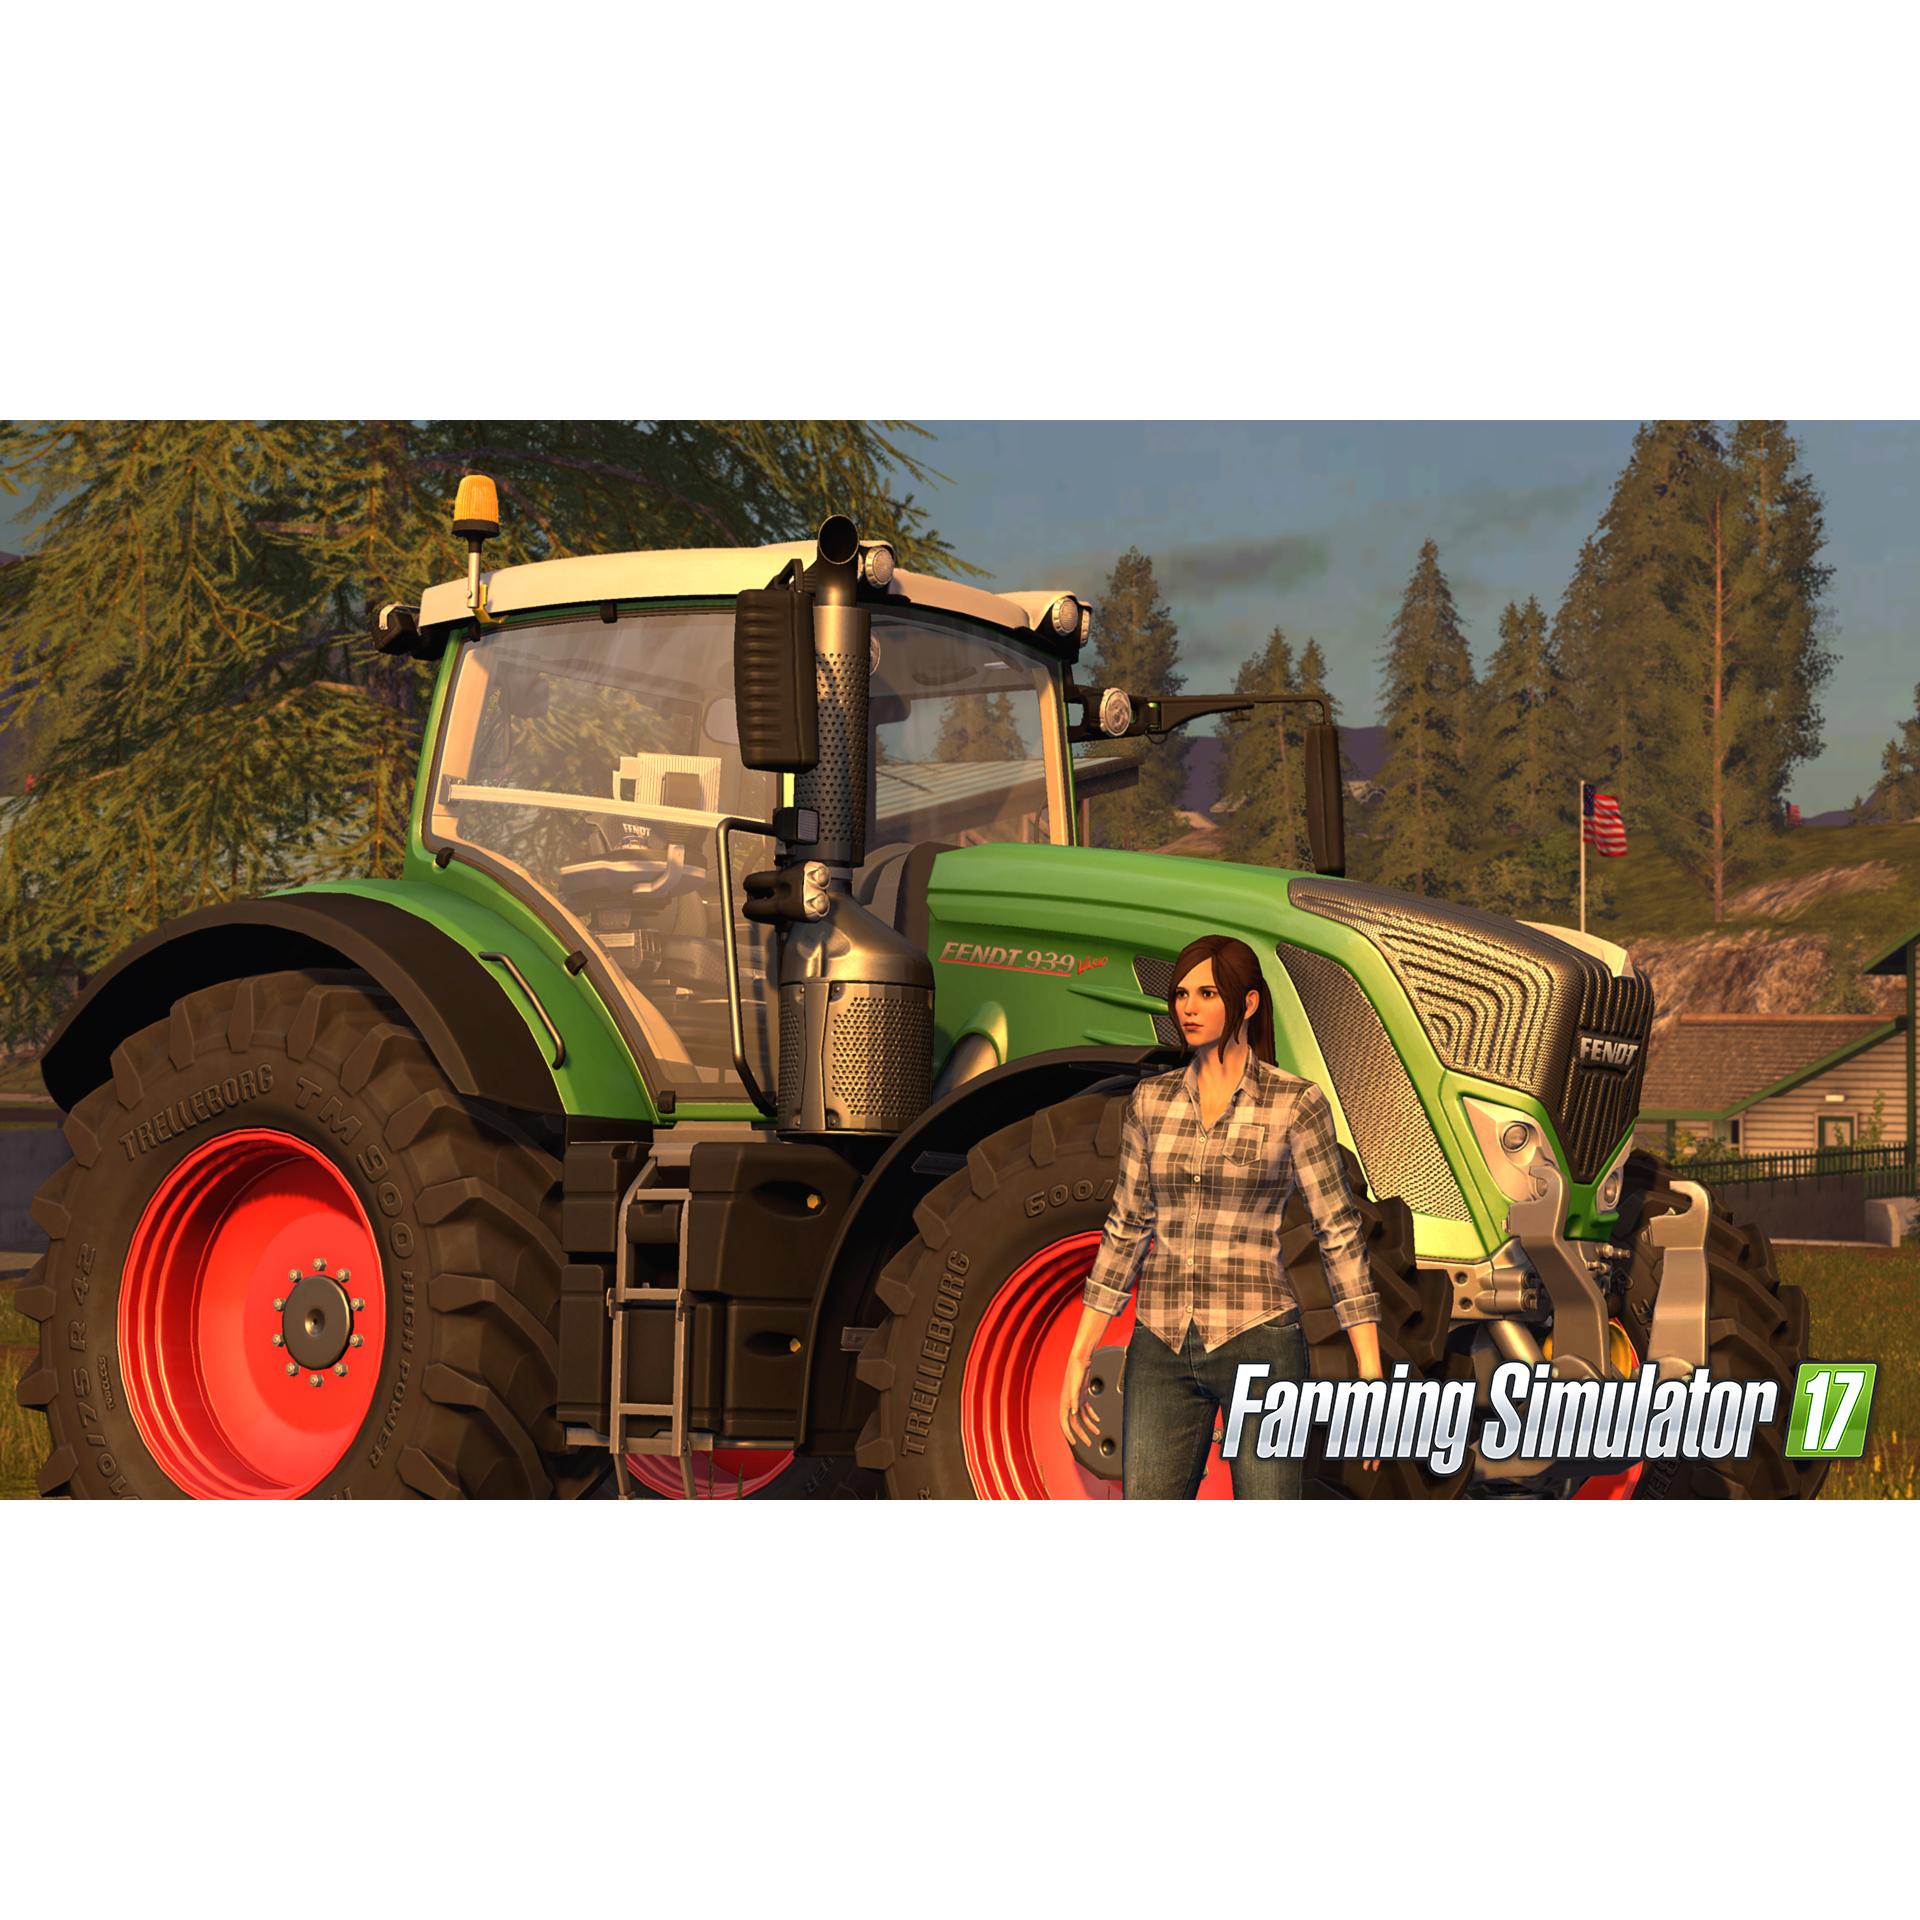 Farming simulator 17 Platinum edition, Xbox One 7